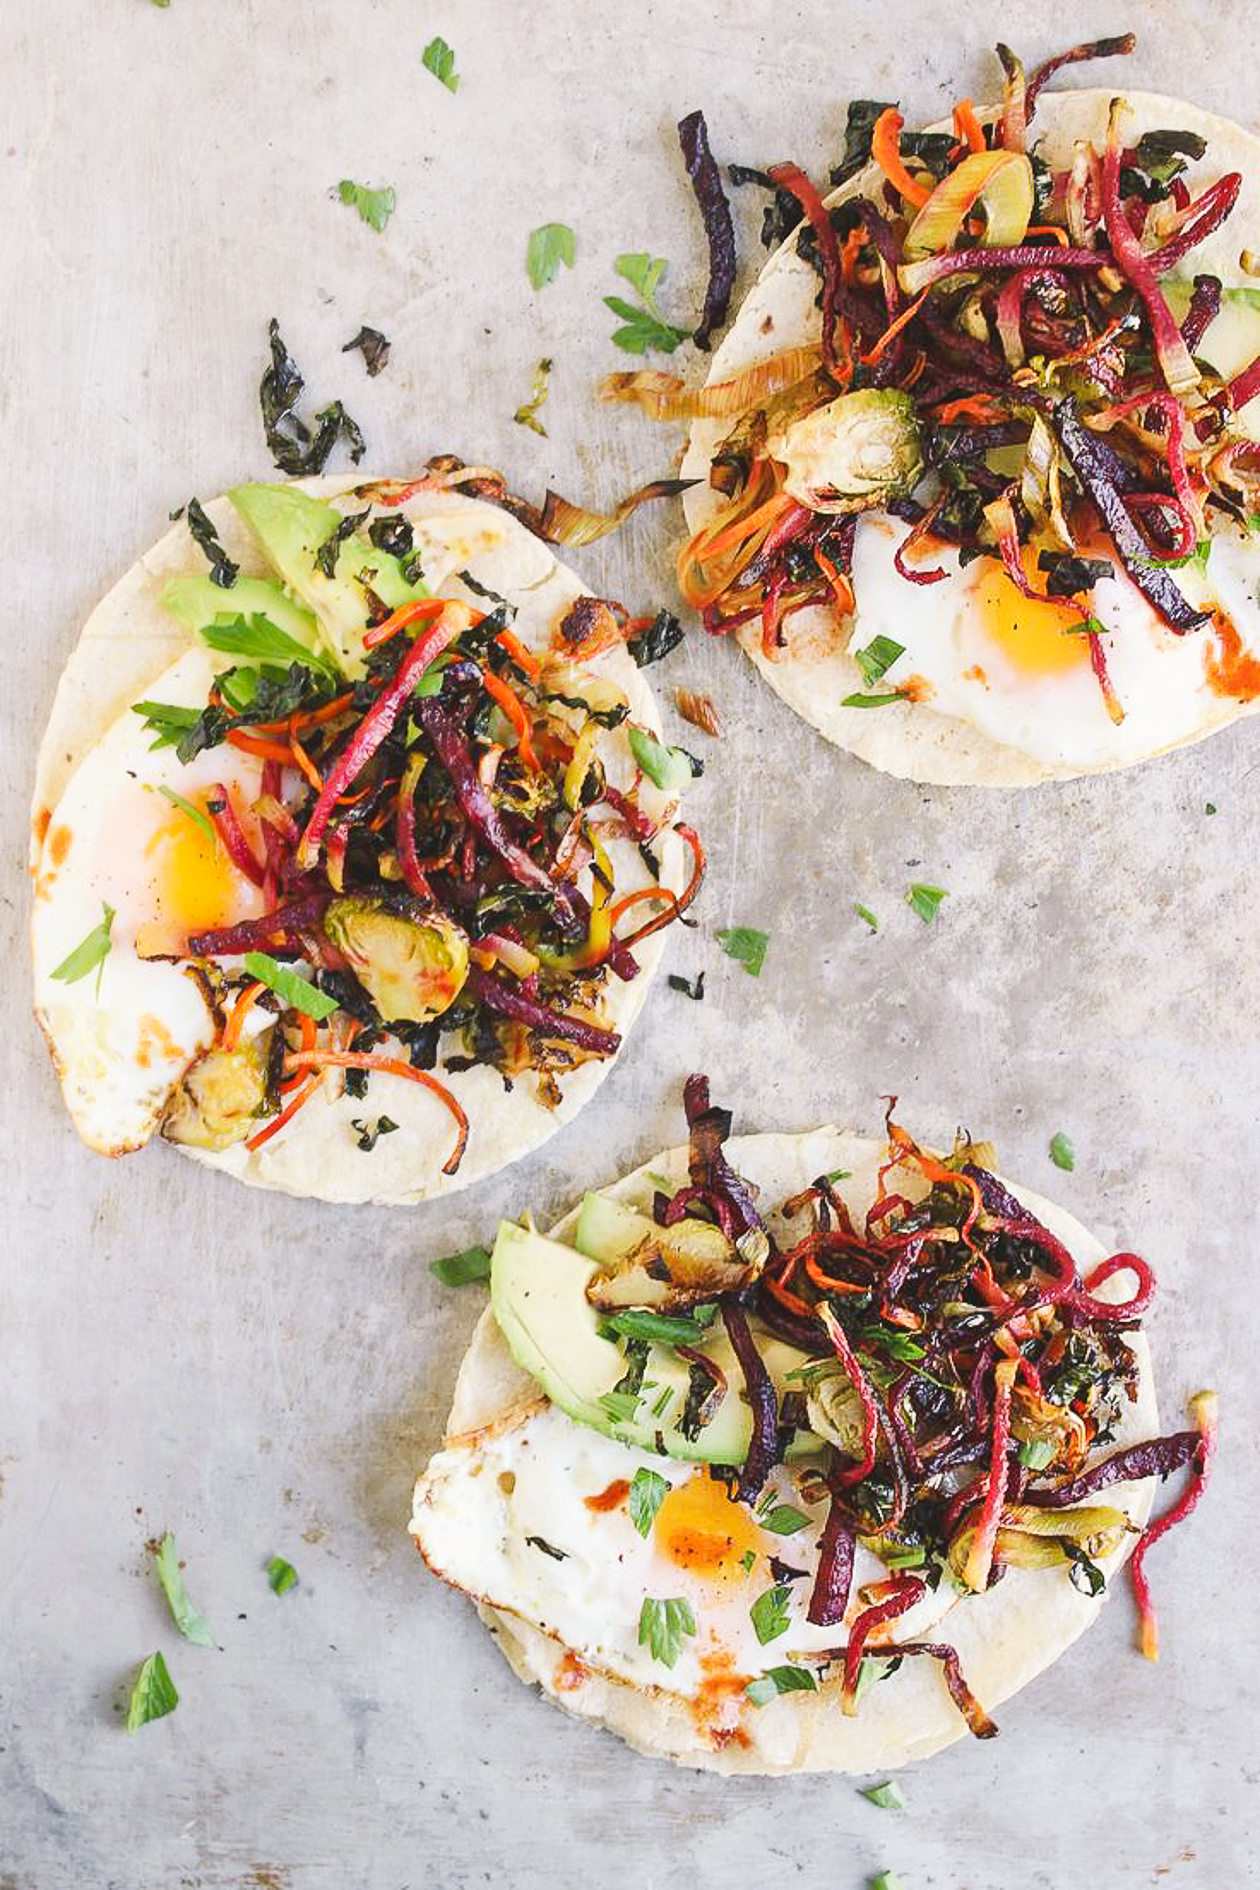 Shredded Harvest Hash Breakfast Tacos